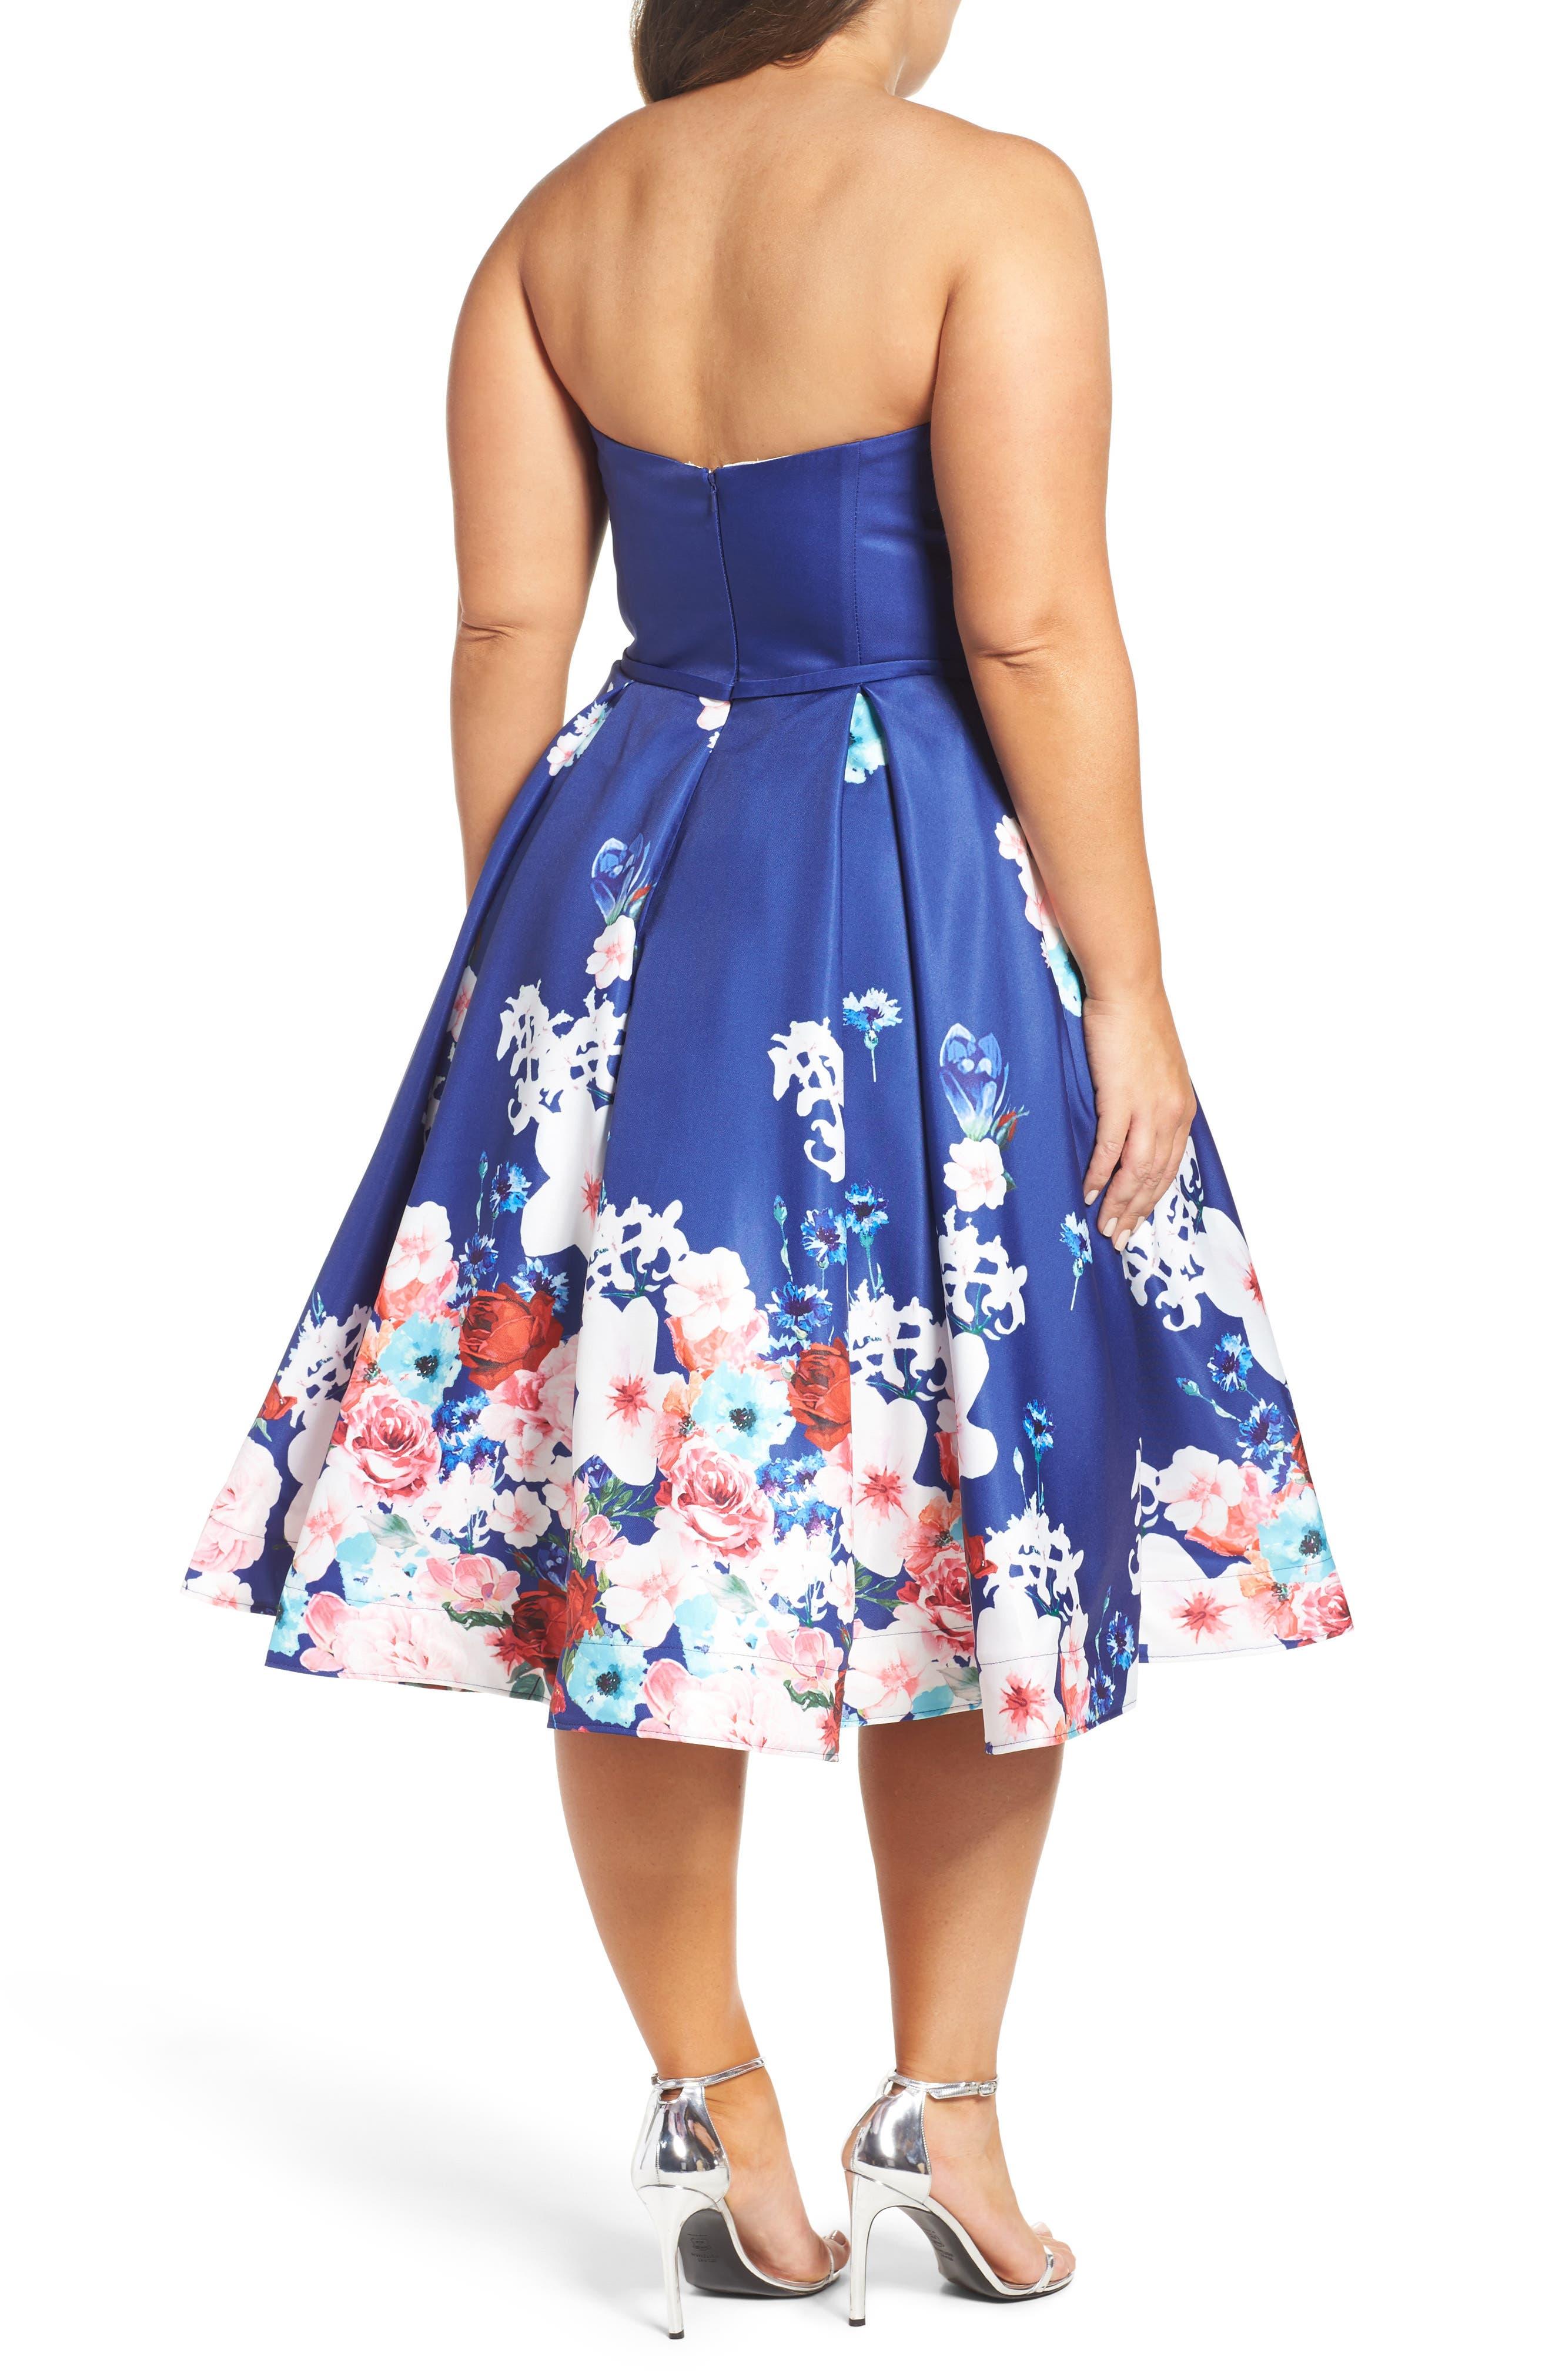 Floral Strapless Cocktail Dress,                             Alternate thumbnail 2, color,                             FLORAL